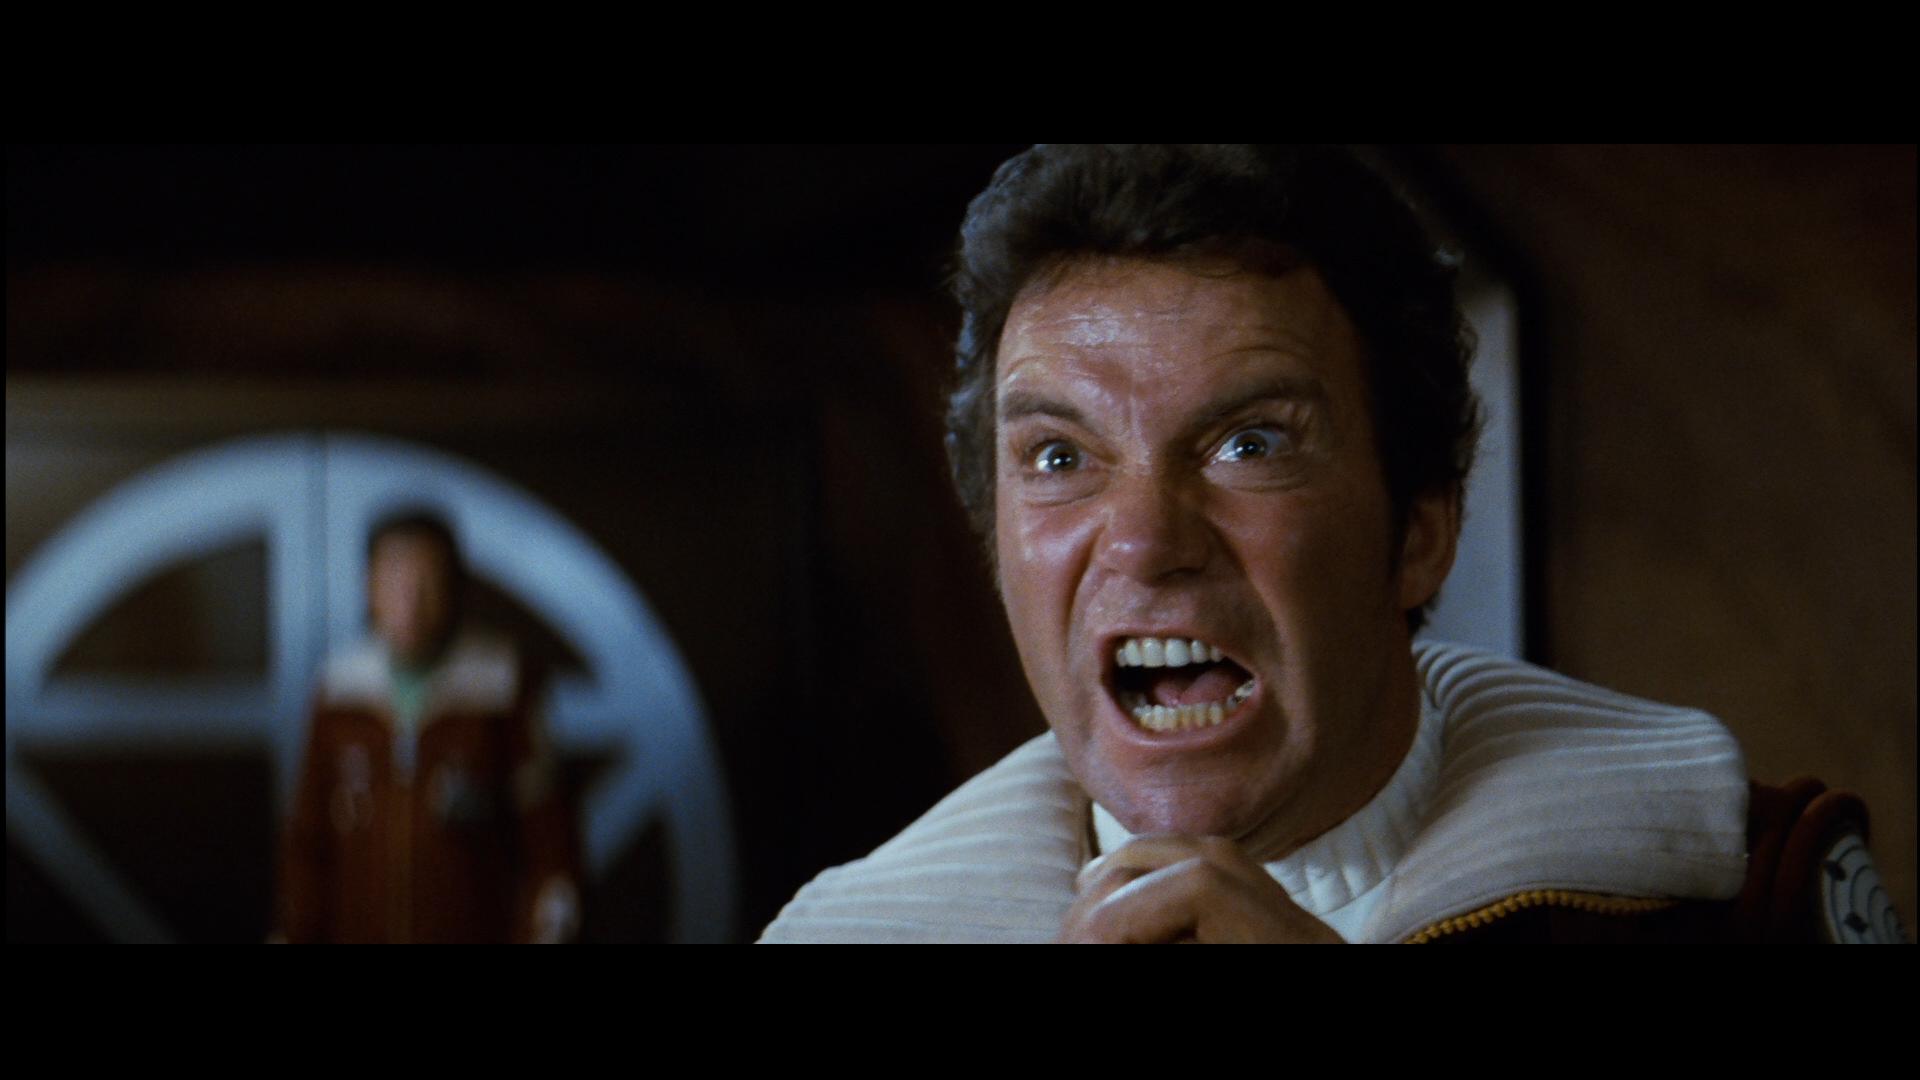 Star Trek Every movie ranked from best to worst  msncom